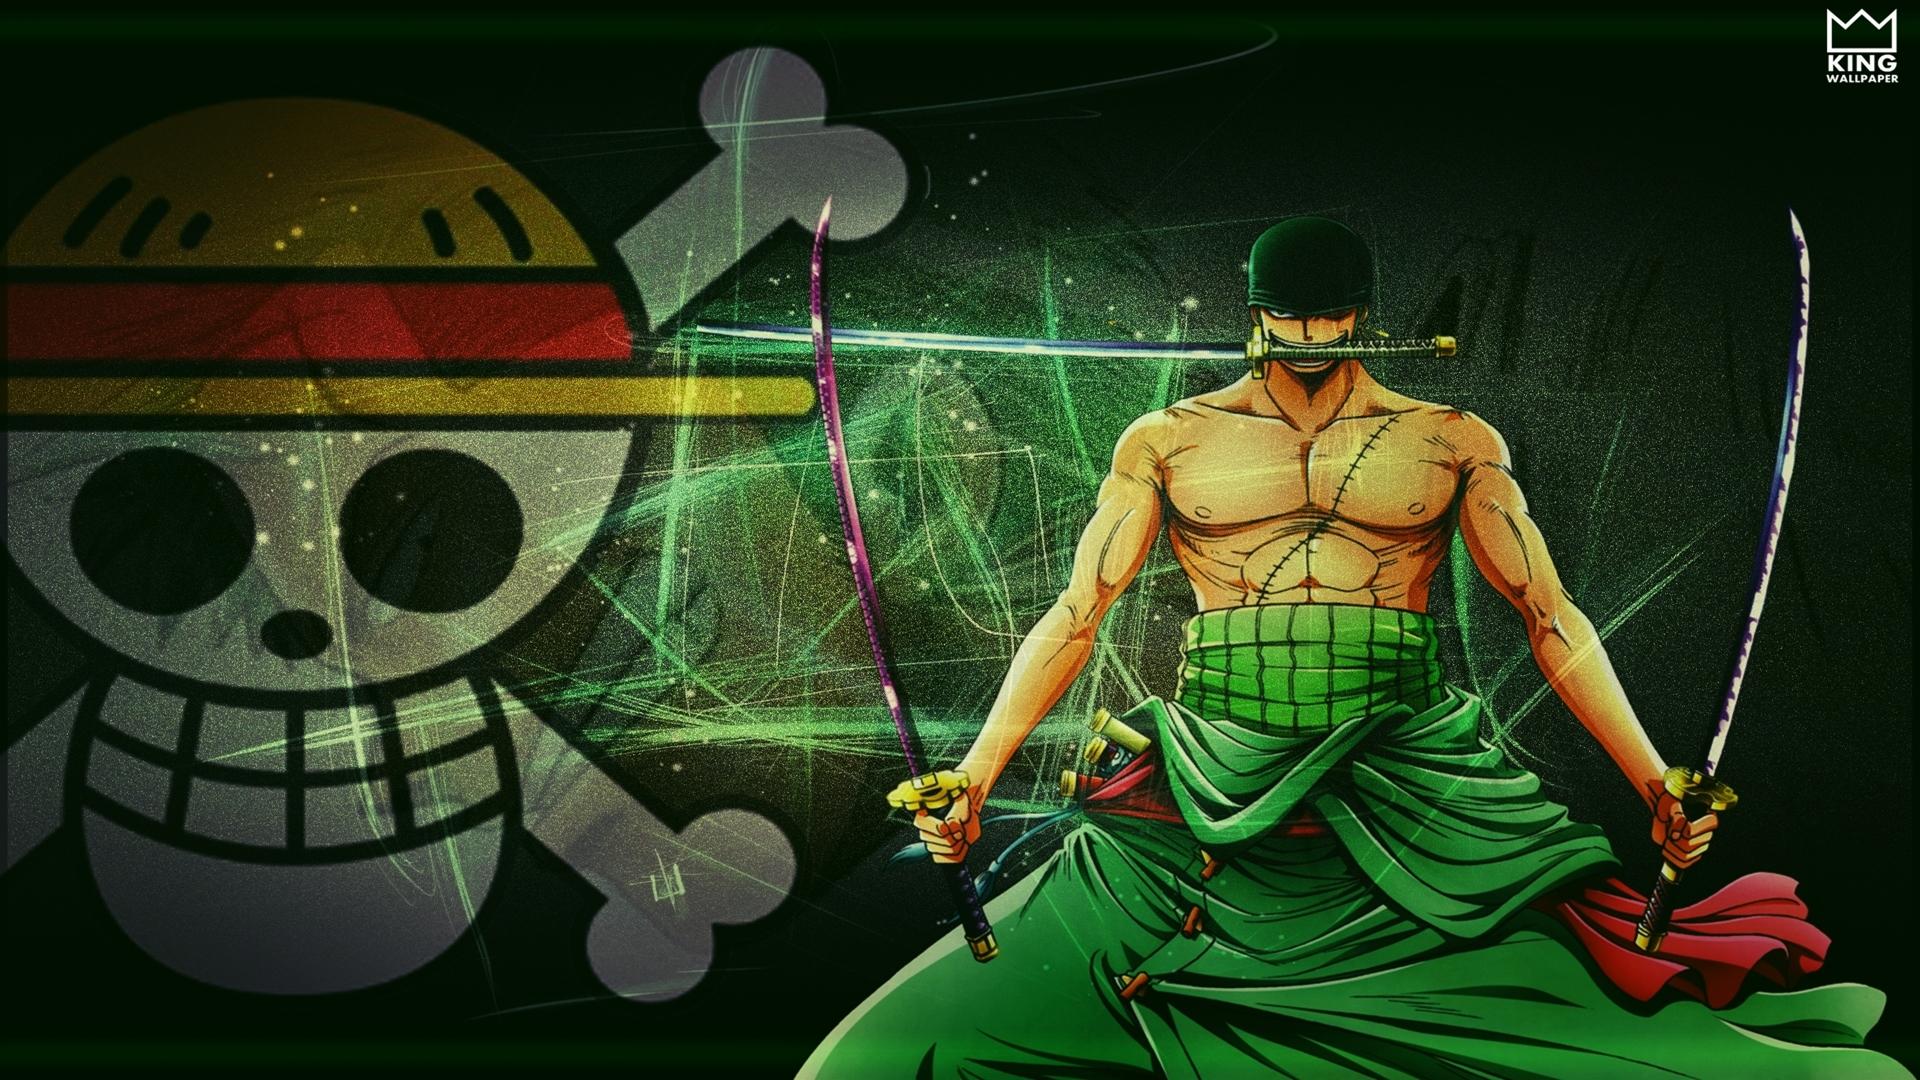 Free Download One Piece Wallpaper Zorro Wallpaper 1323178